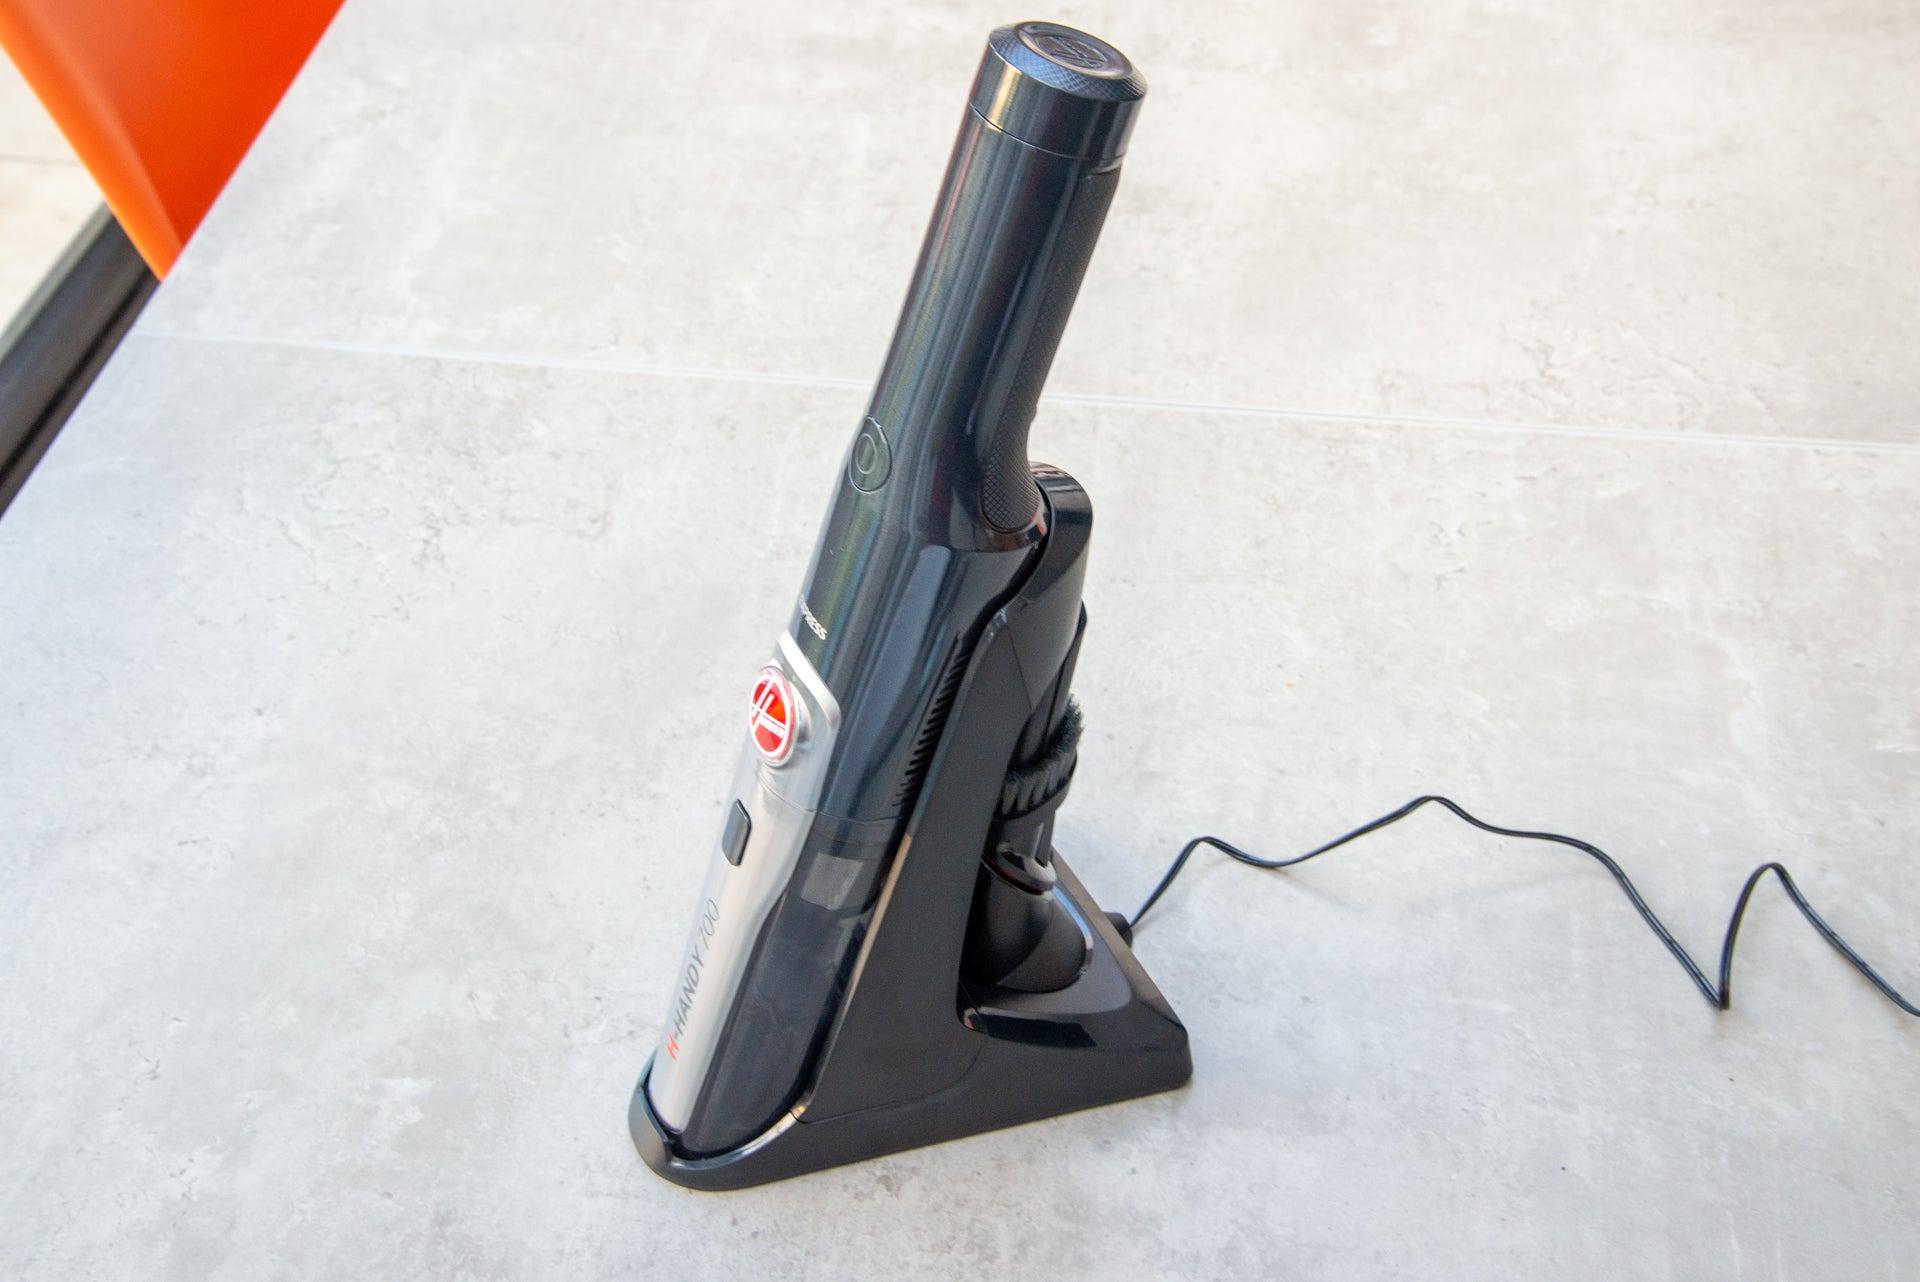 The best handheld vacuum is the Hoover H-Handy 700